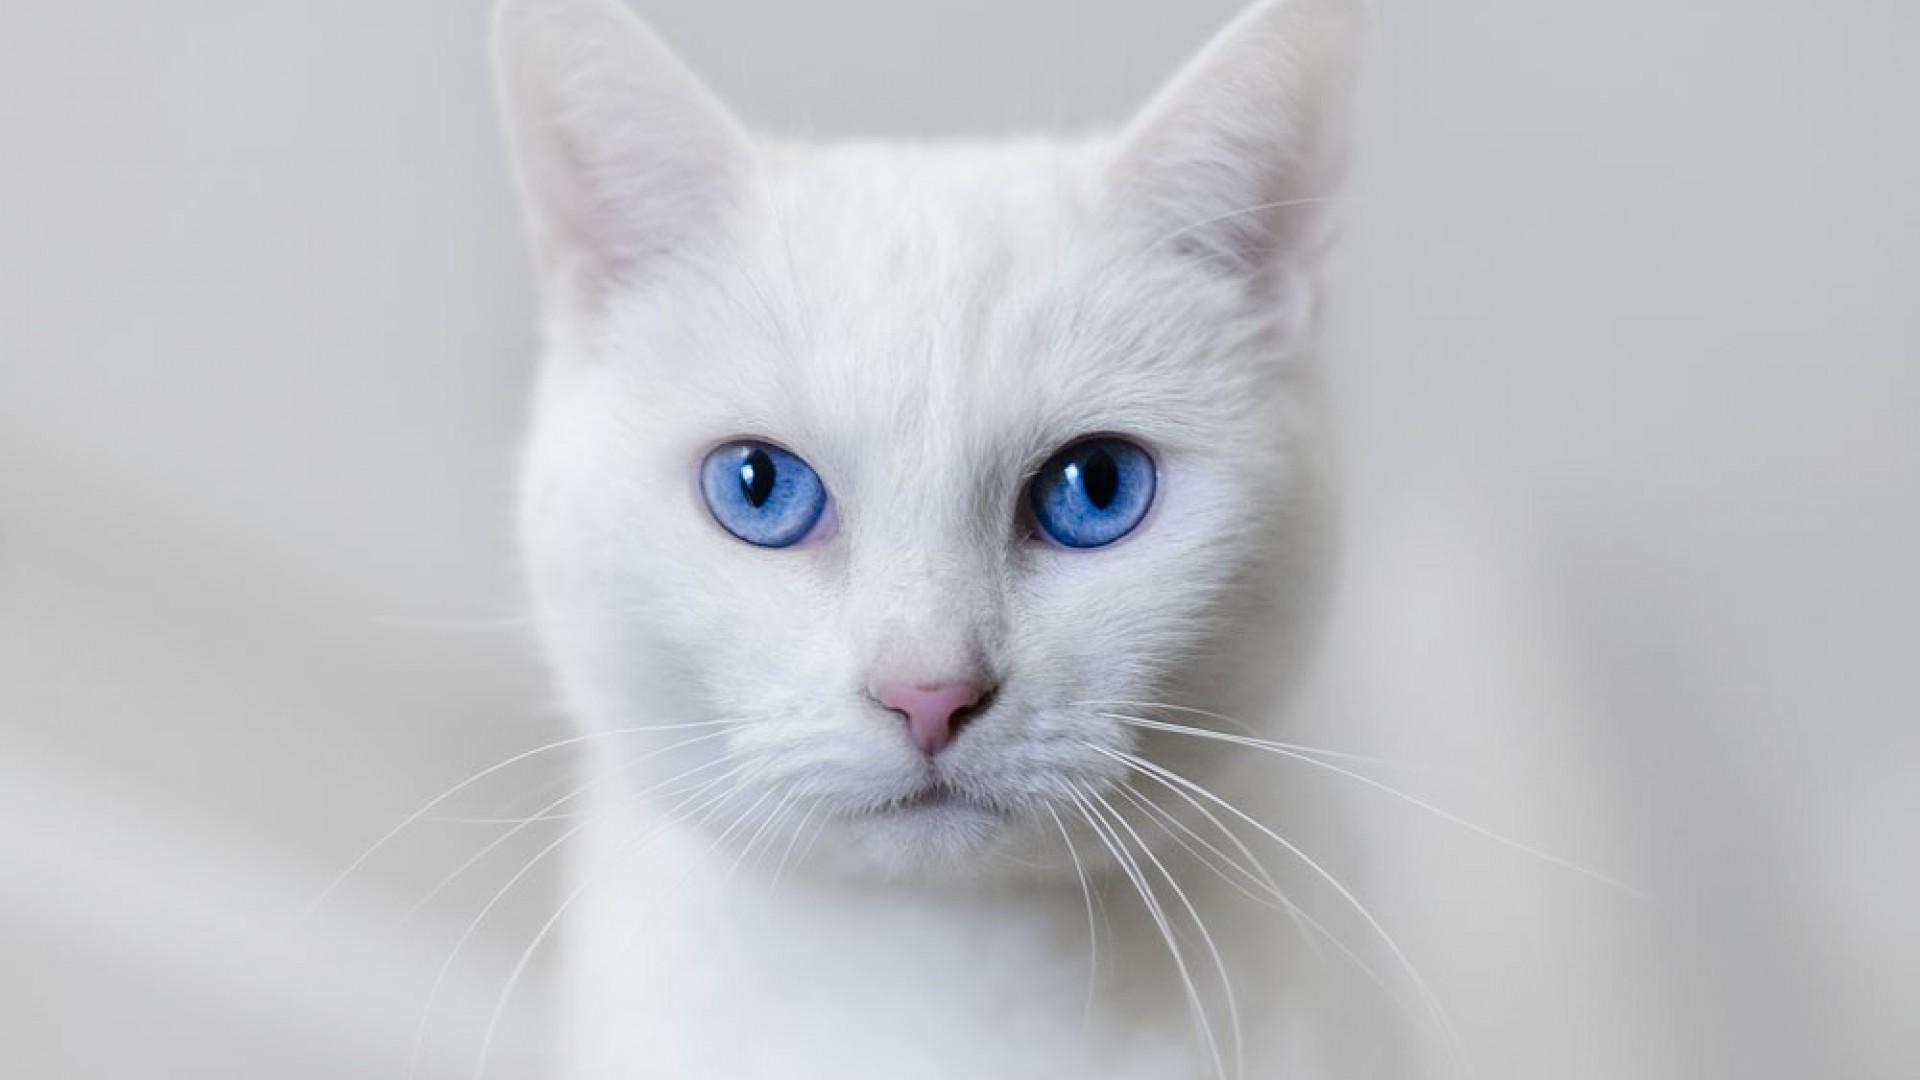 white cat, the face, silence, blue eyes, macro, hd wallpaper